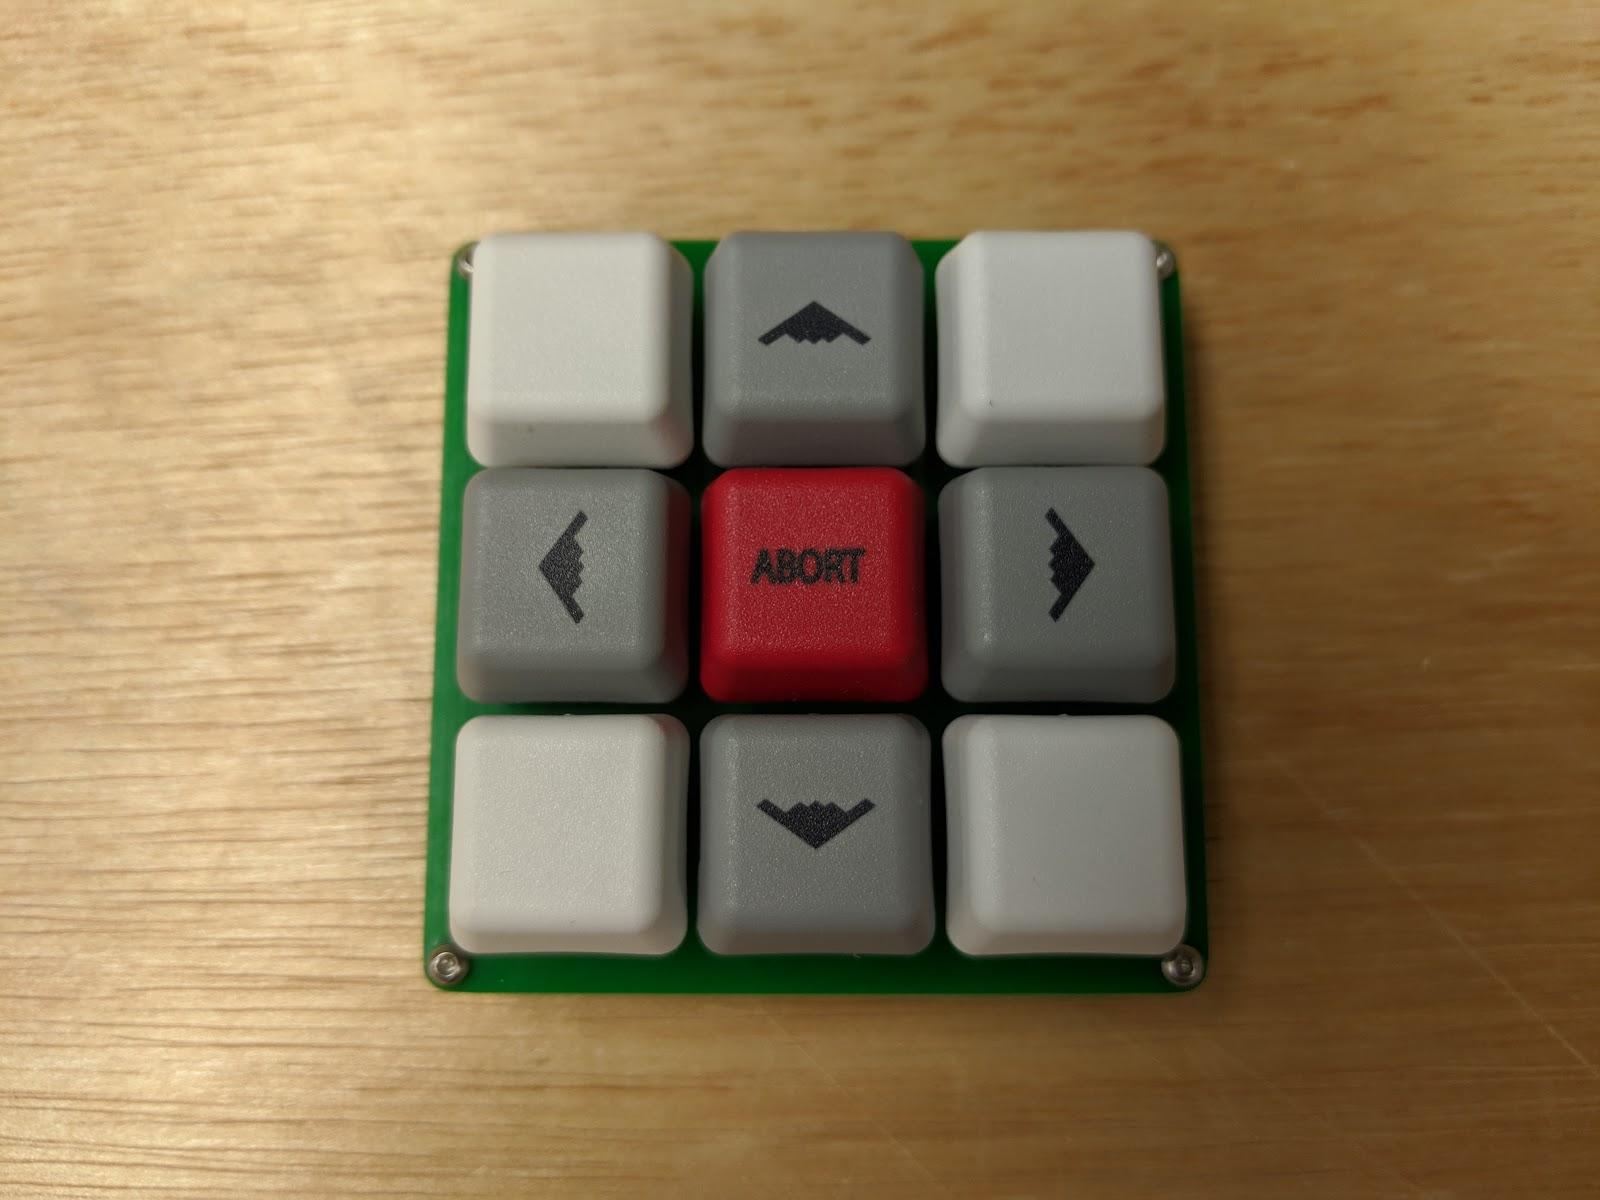 40% Keyboards